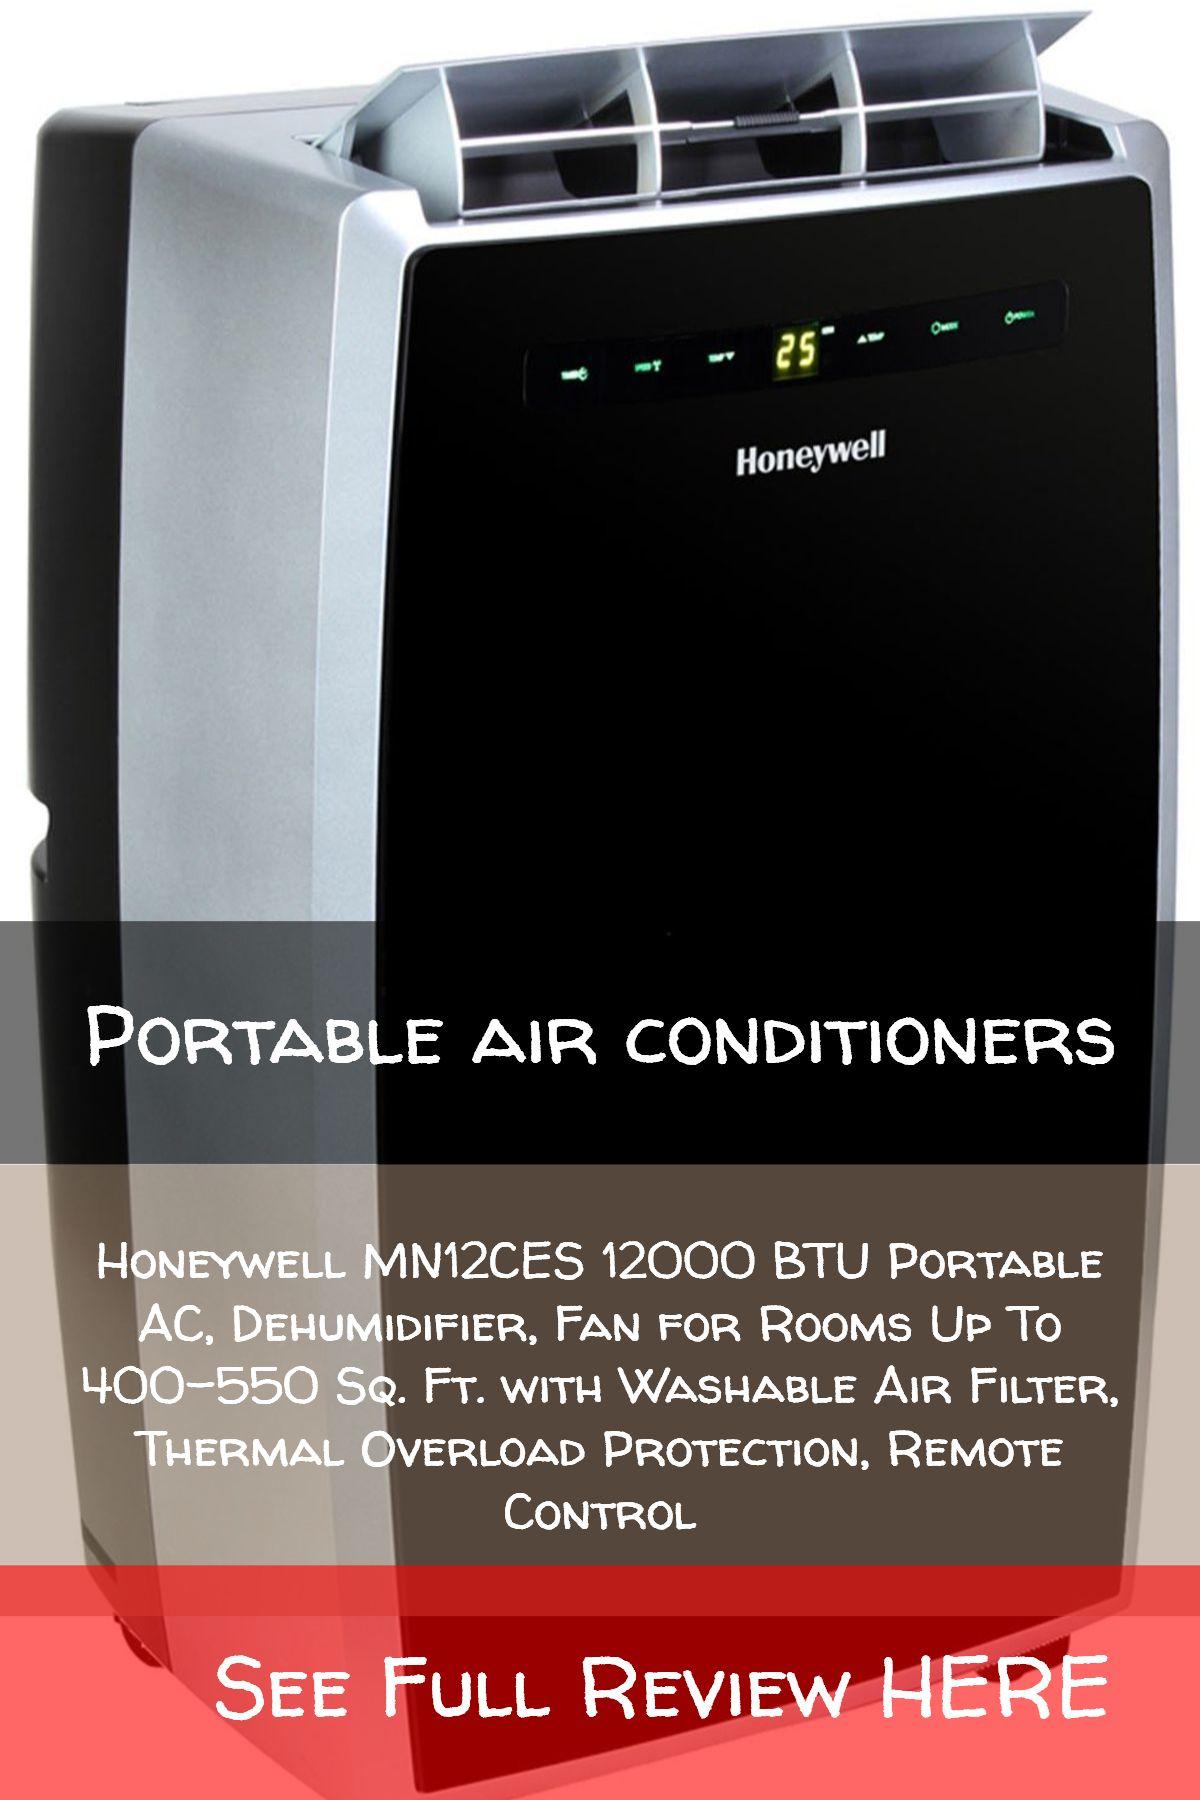 Portable air conditioners / Honeywell MN12CES 12000 BTU